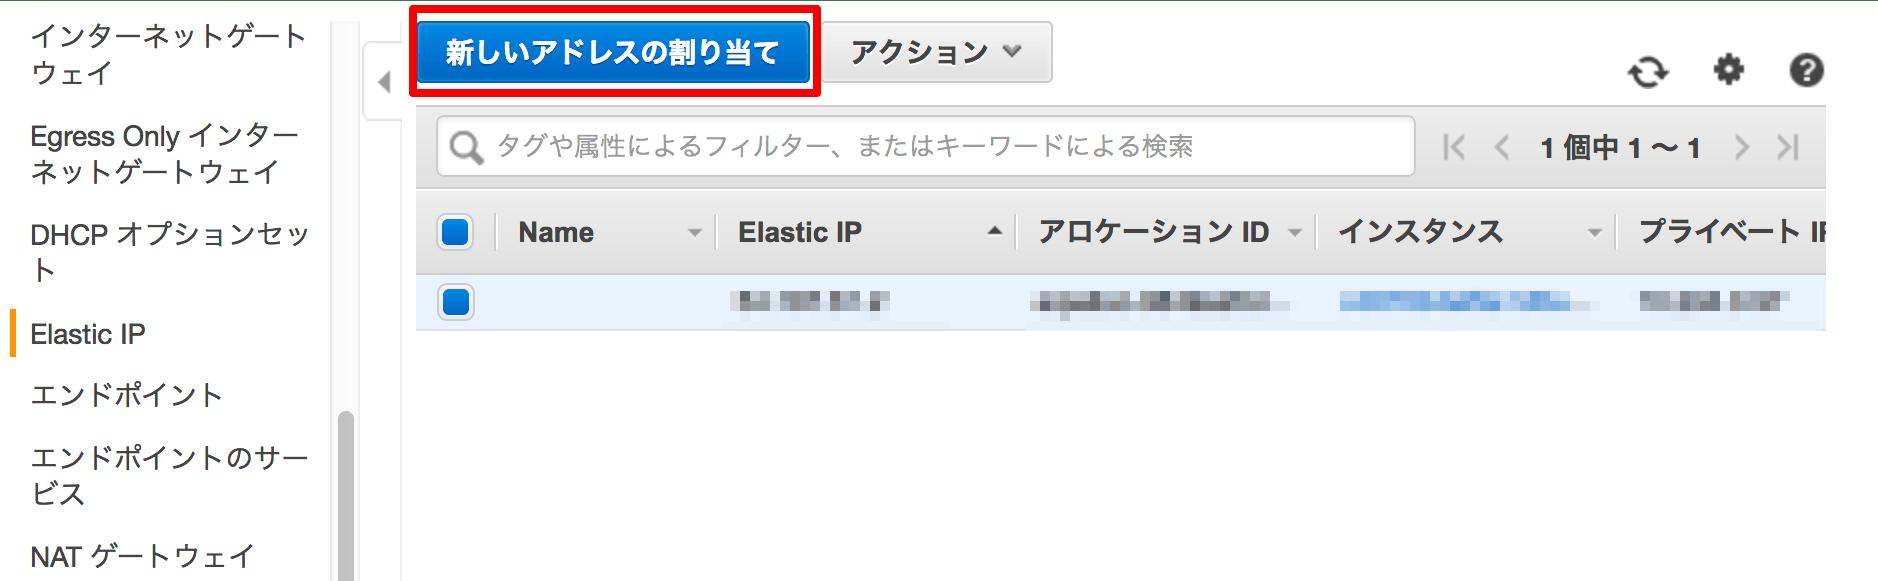 Elastic IP   VPC Management Console_2018-12-12_09-10-37.png